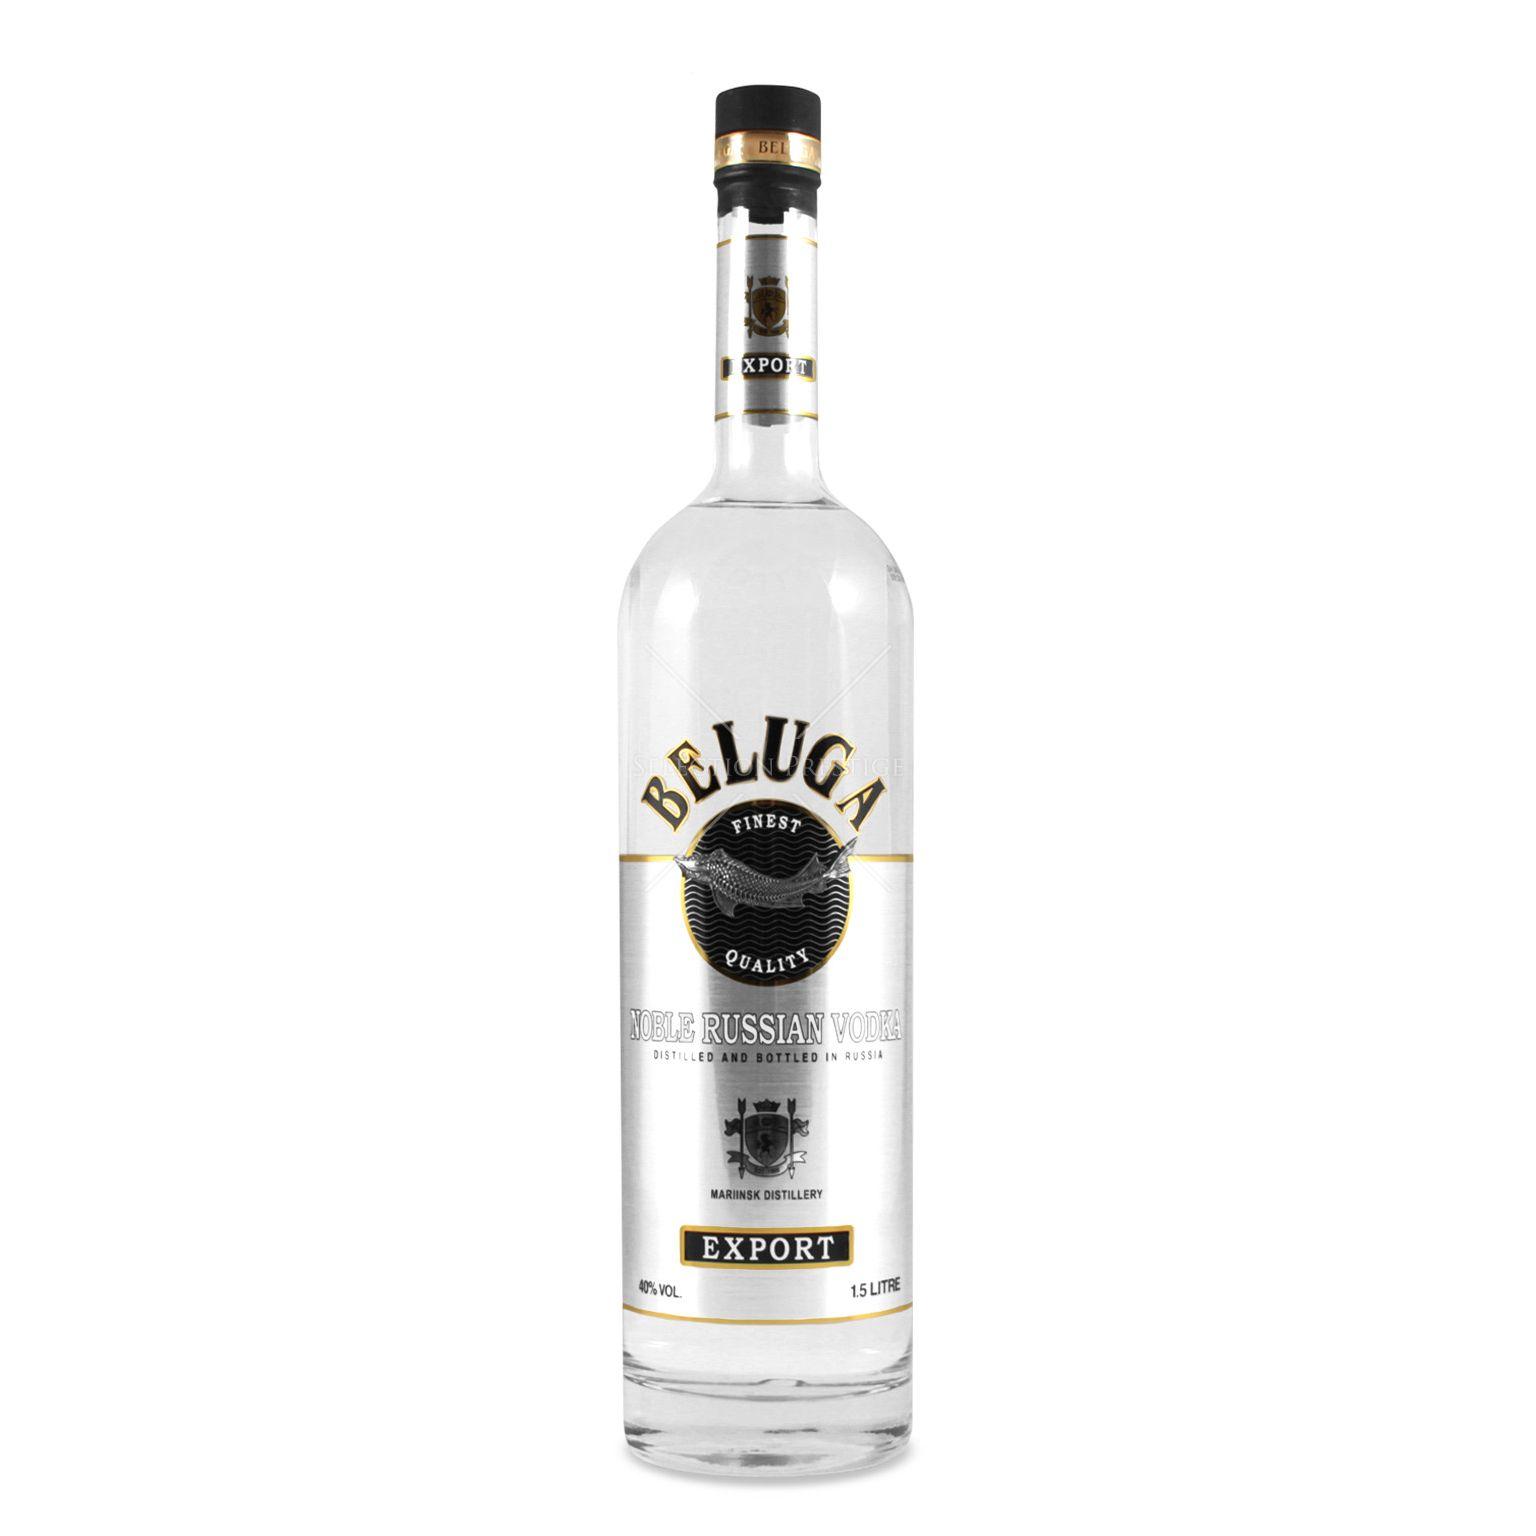 Beluga Noble Russian Vodka 1,5L (40% Vol.) - Beluga - Vodka